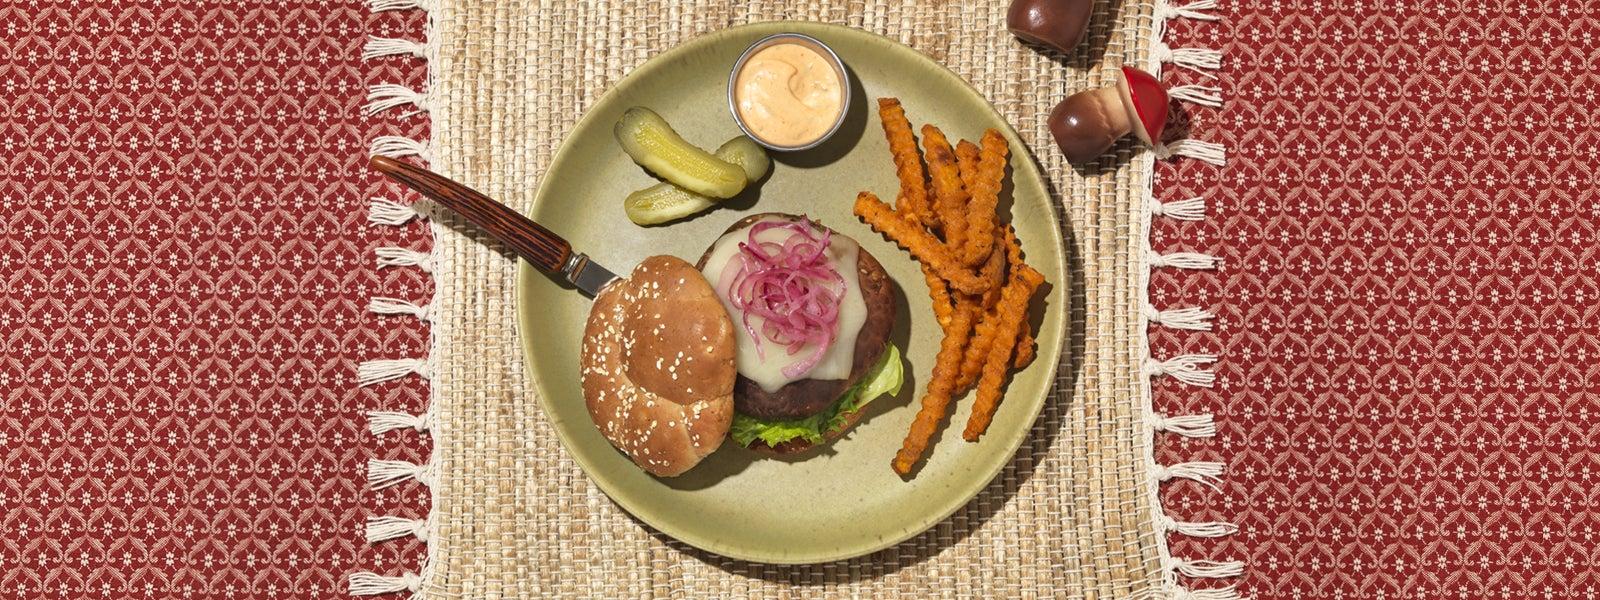 Grilled Teriyaki Portobello Burgers with Smoked Gouda